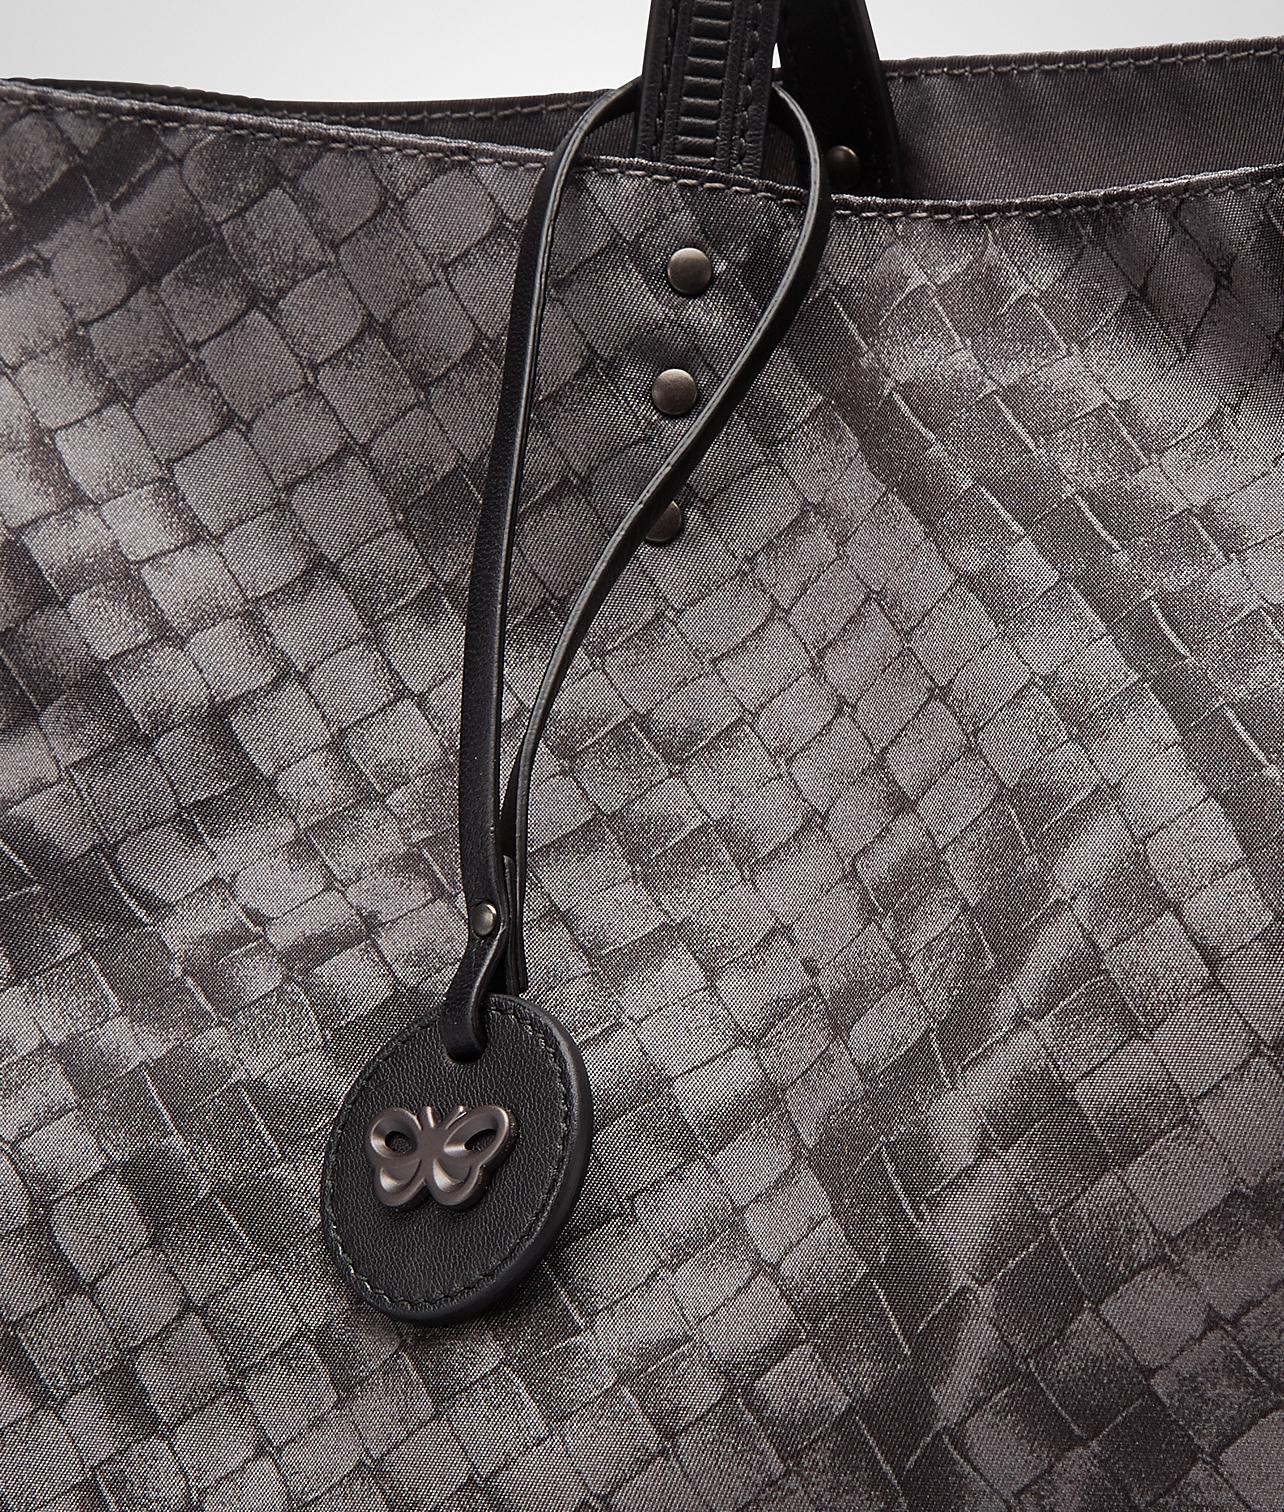 fb57603d959 Bottega veneta New Light Grey Intrecciolusion Large Tote in Gray .